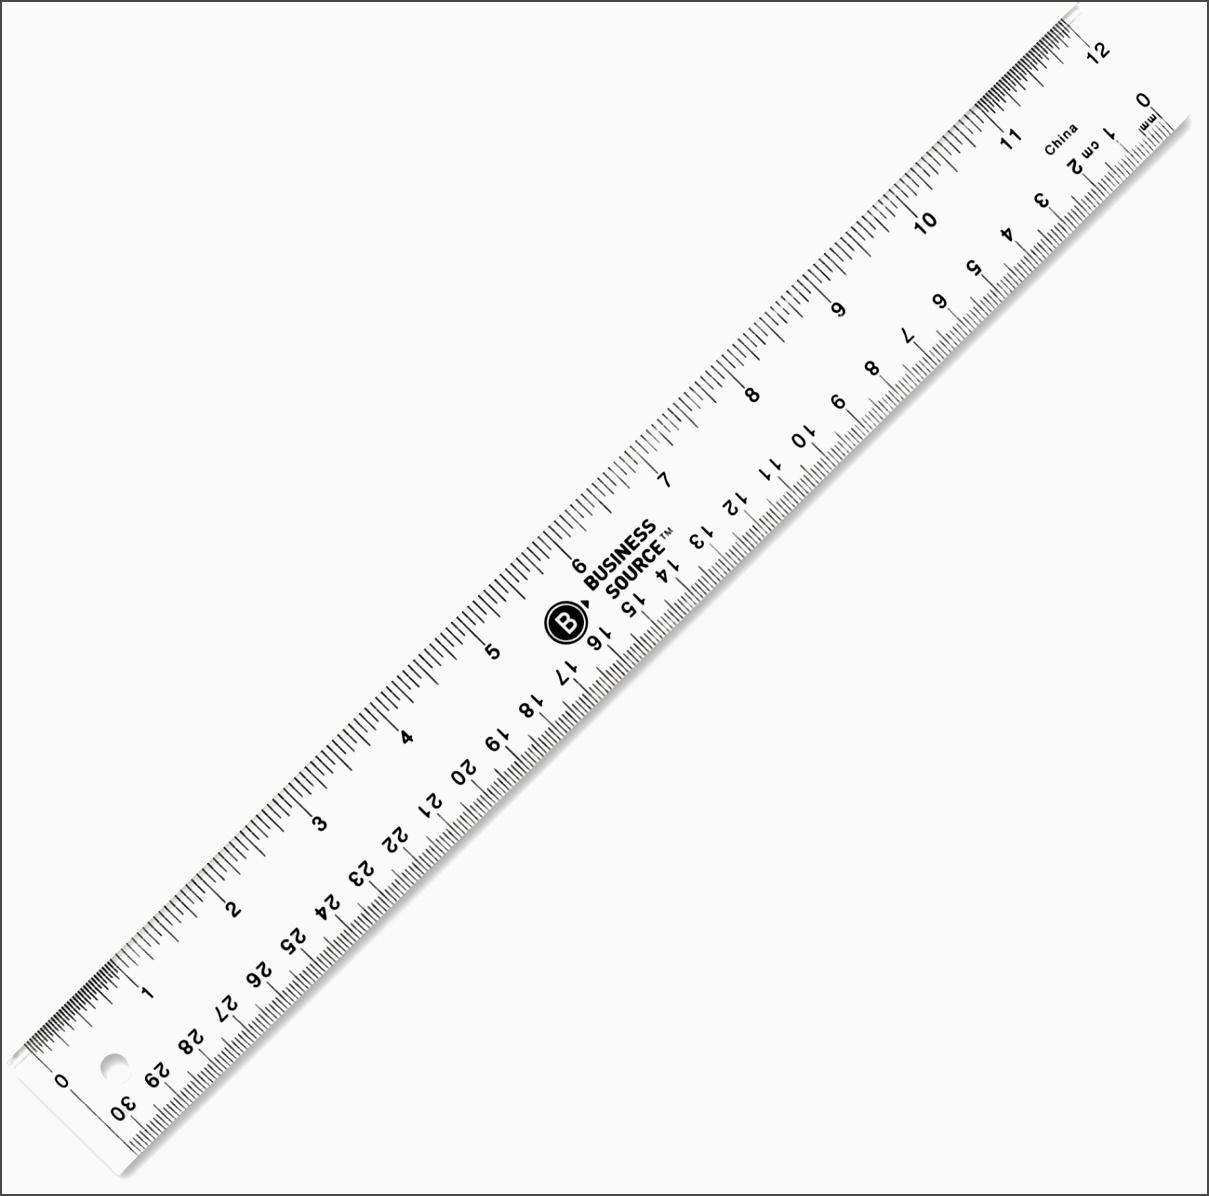 18 Inch Printable Ruler